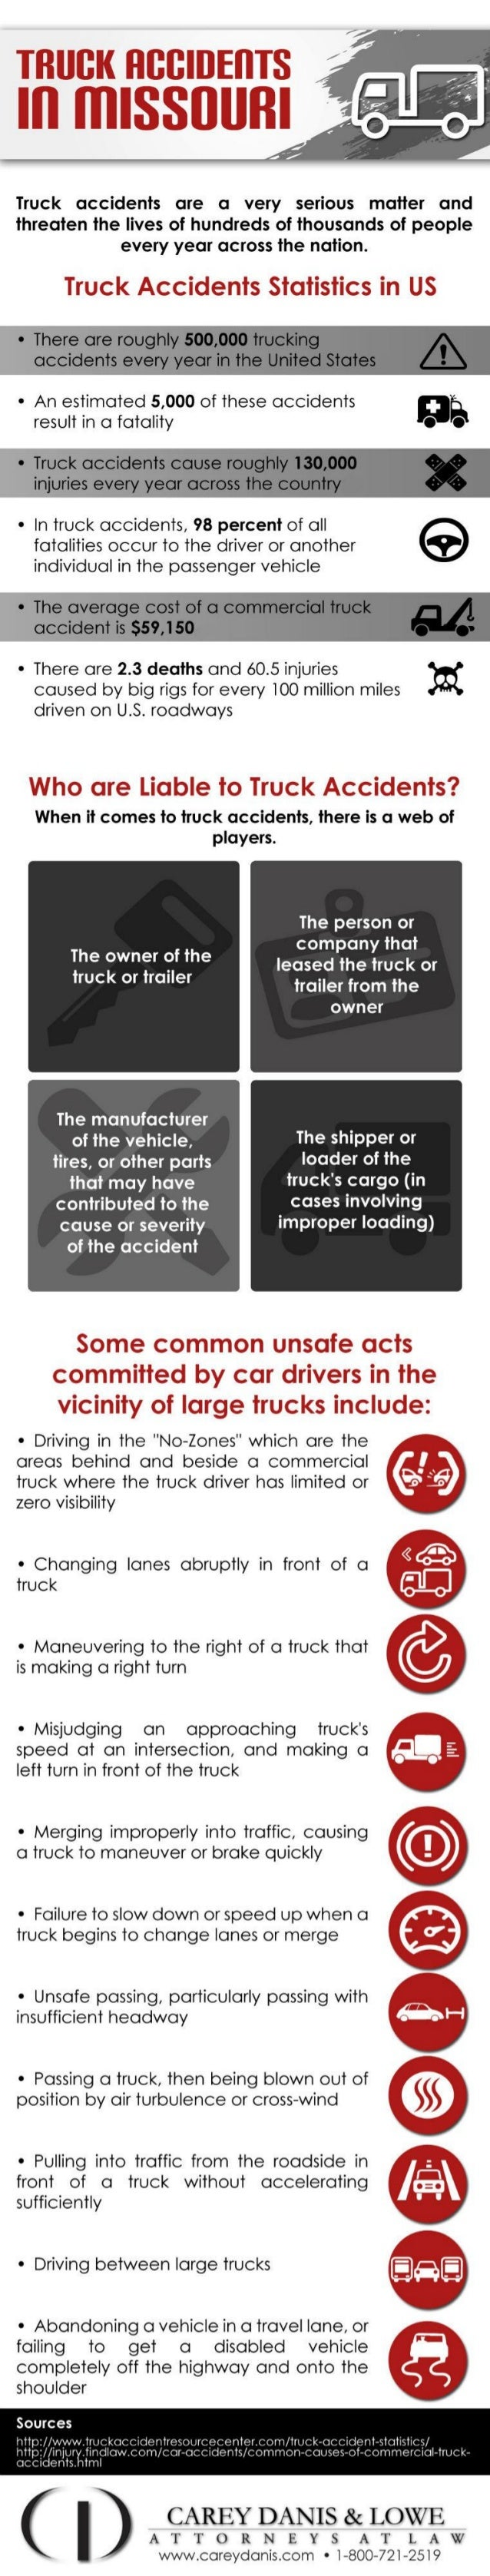 Truck Accidents in Missouri